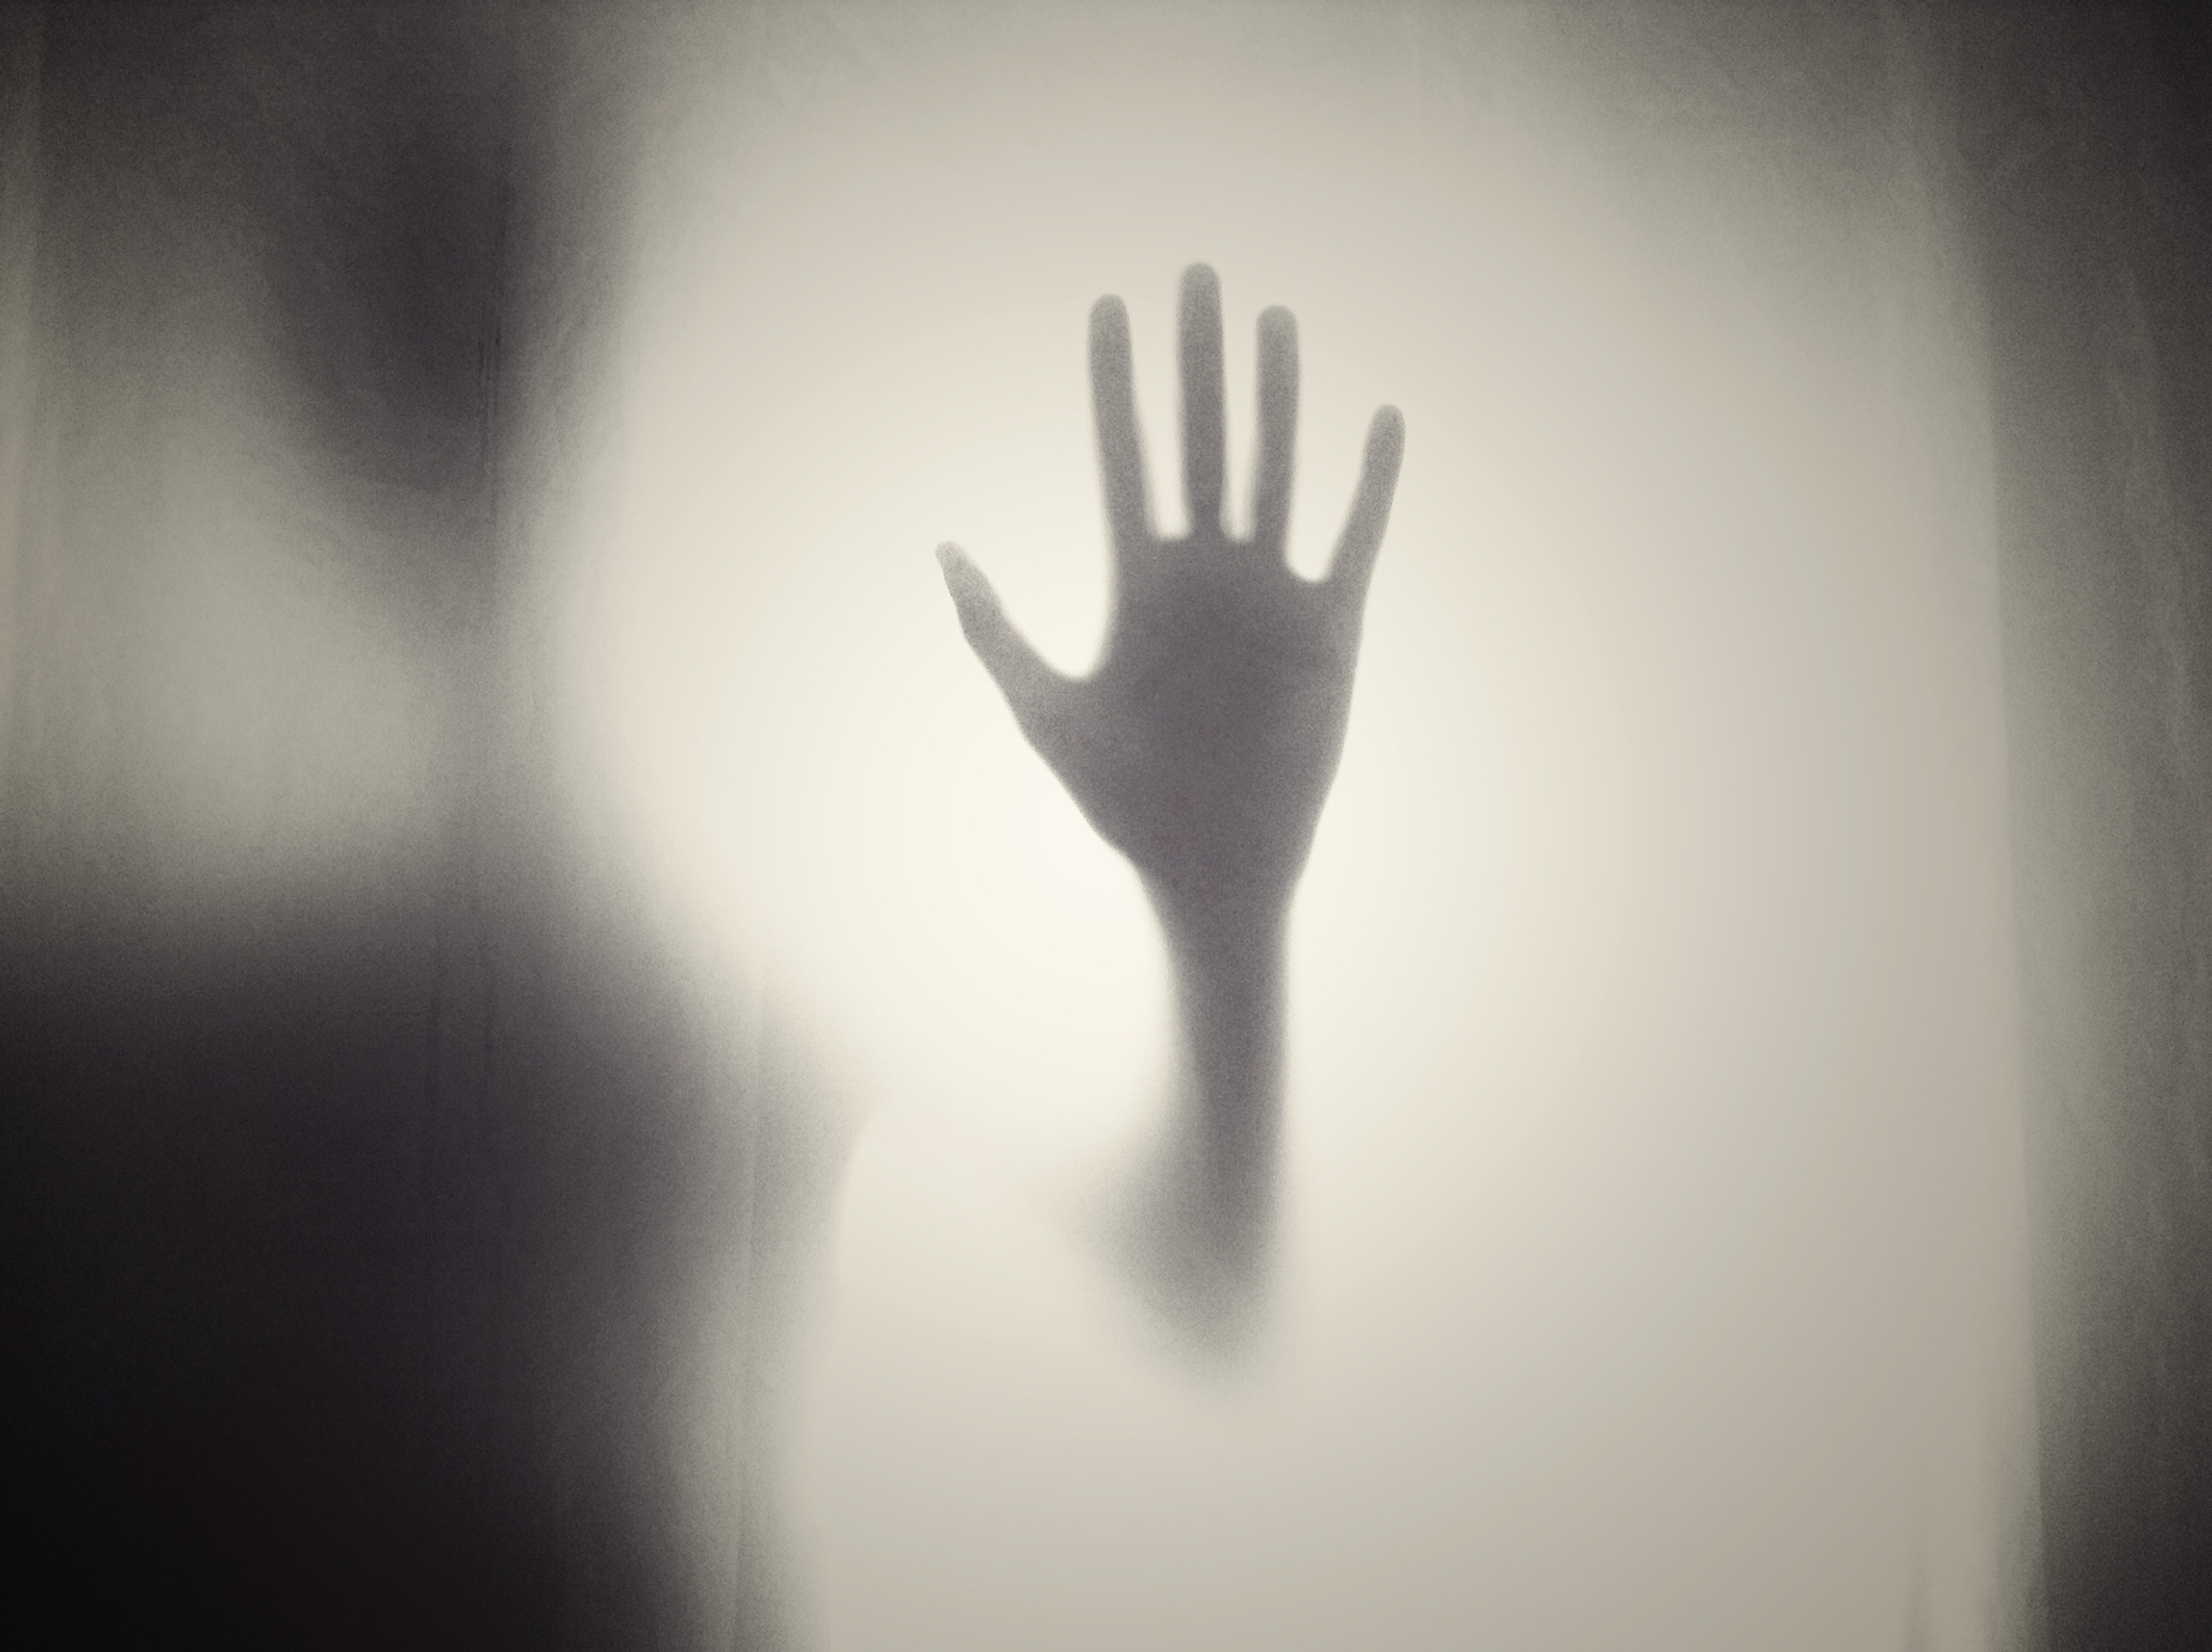 Hand im Nebel